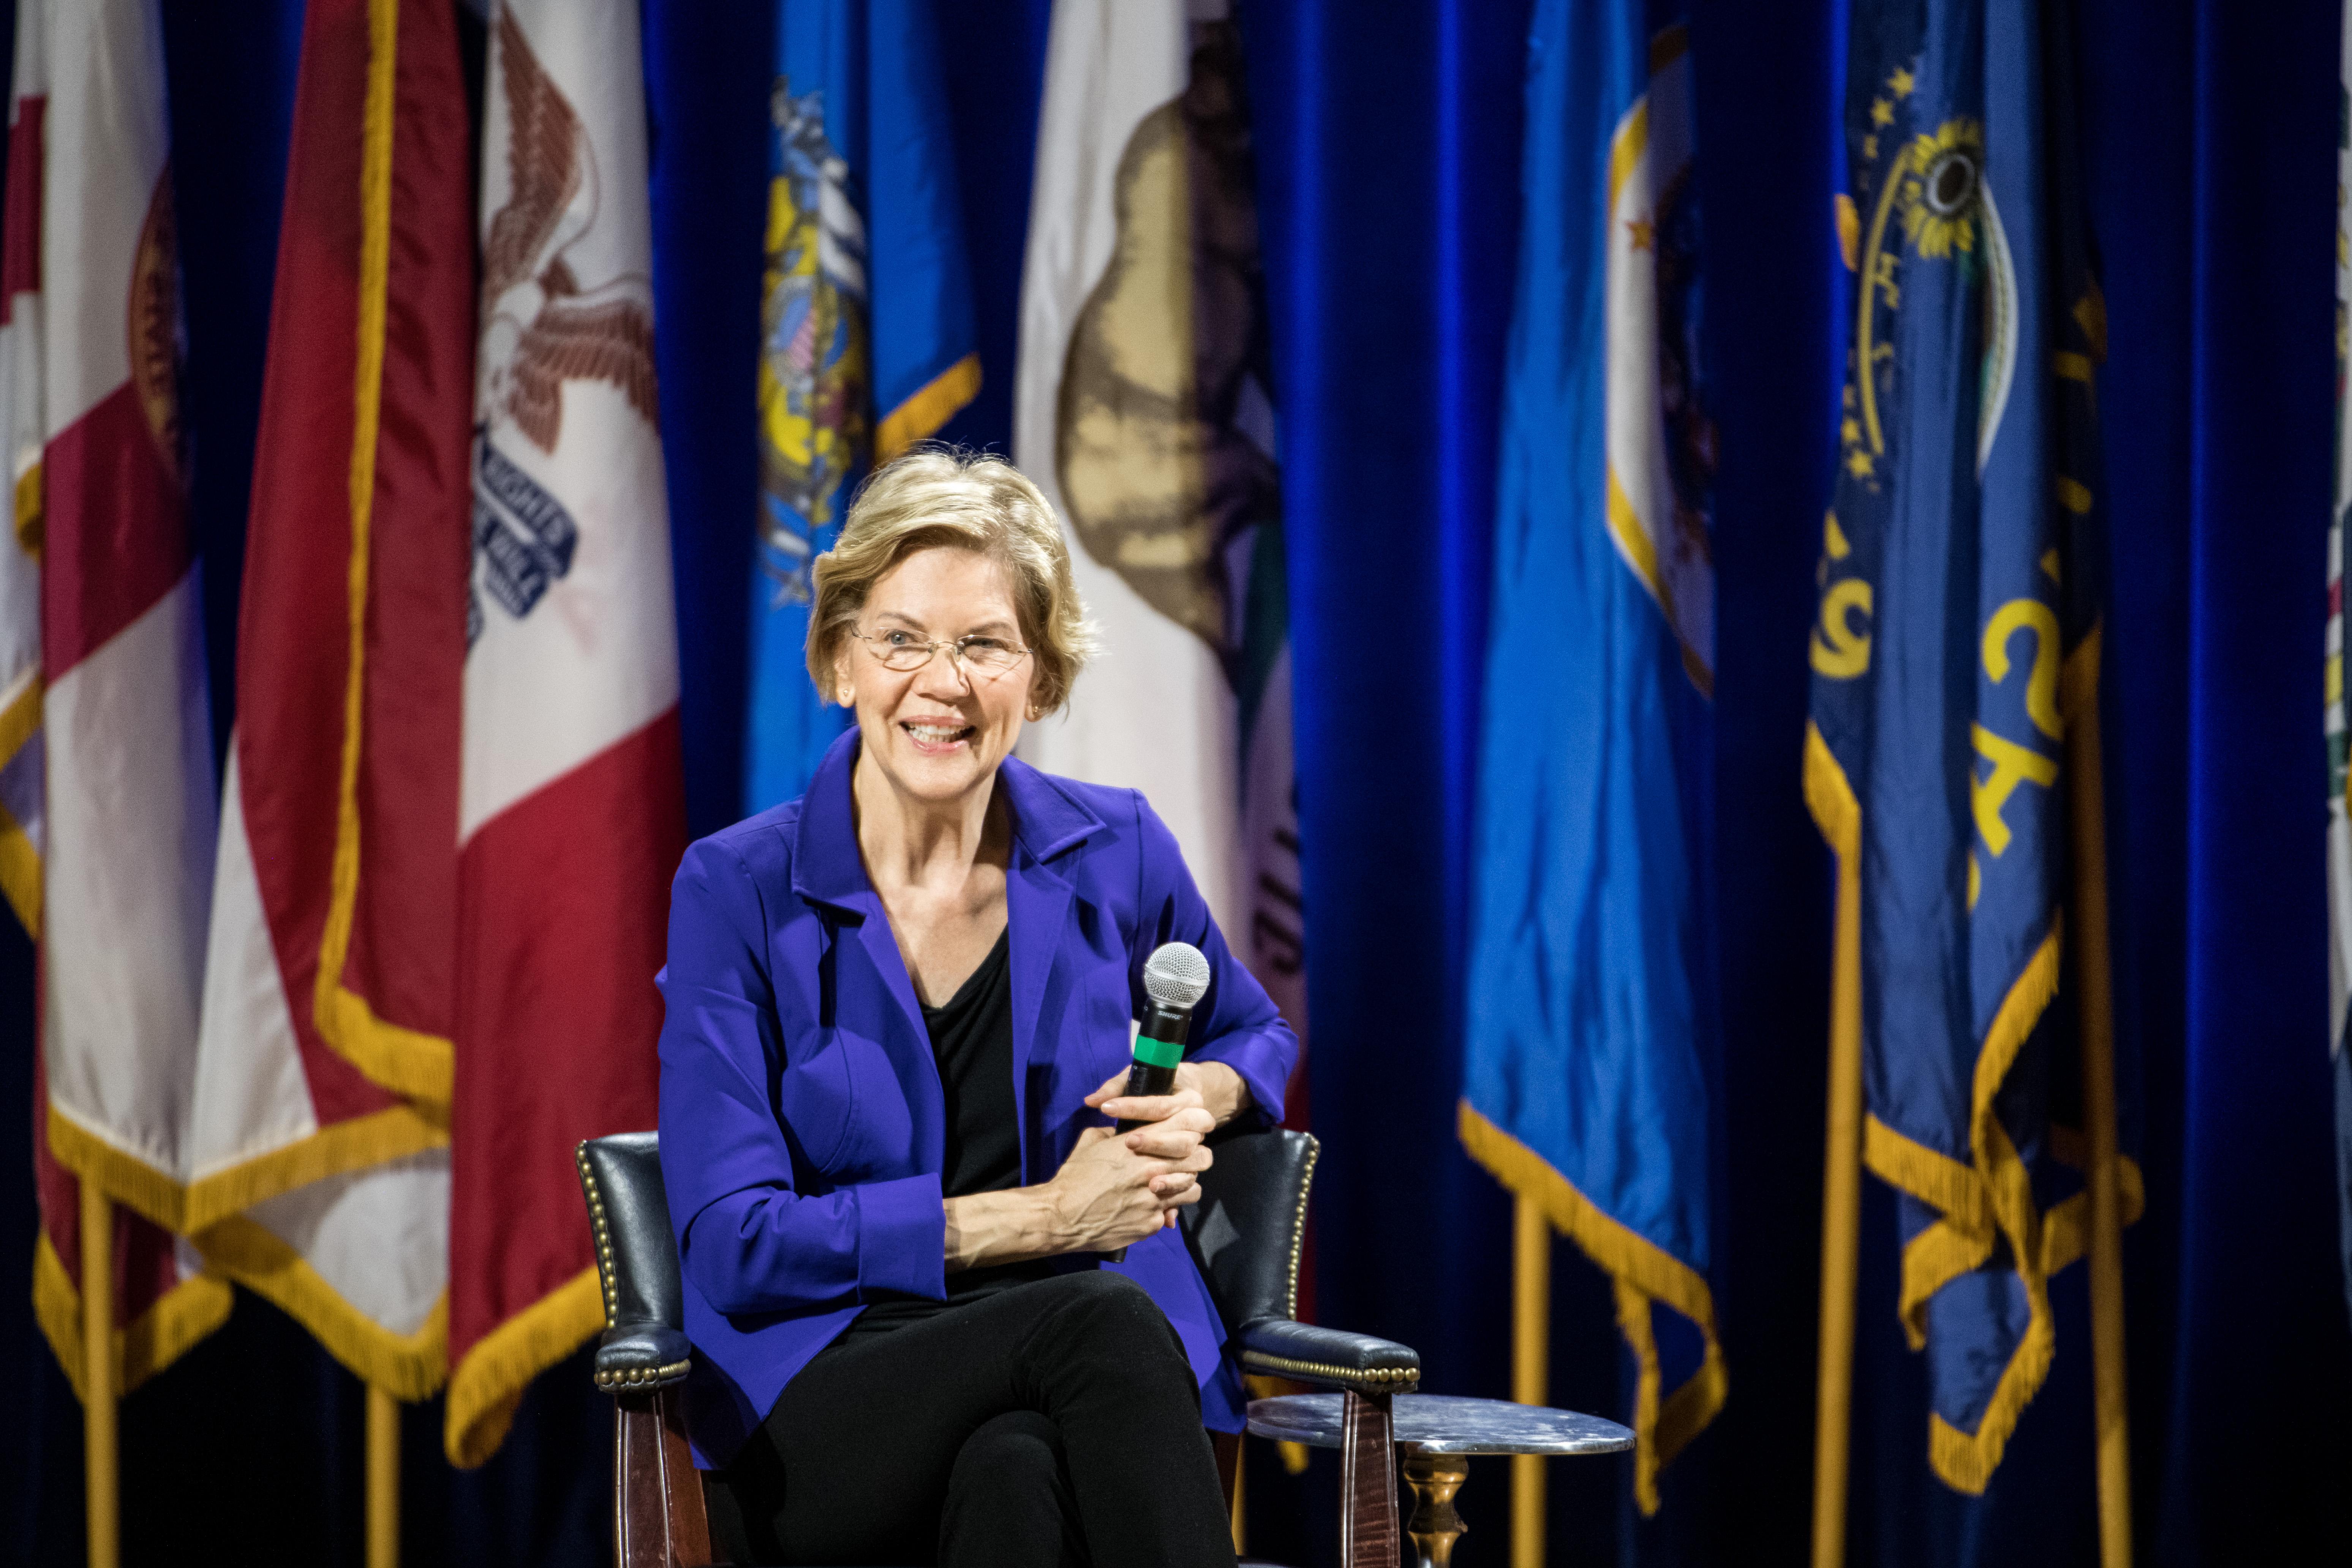 Democratic presidential candidate Sen. Elizabeth Warren (D-MA) addresses the audience at a South Carolina State University  event on Nov. 8, 2019 in Orangeburg, South Carolina.